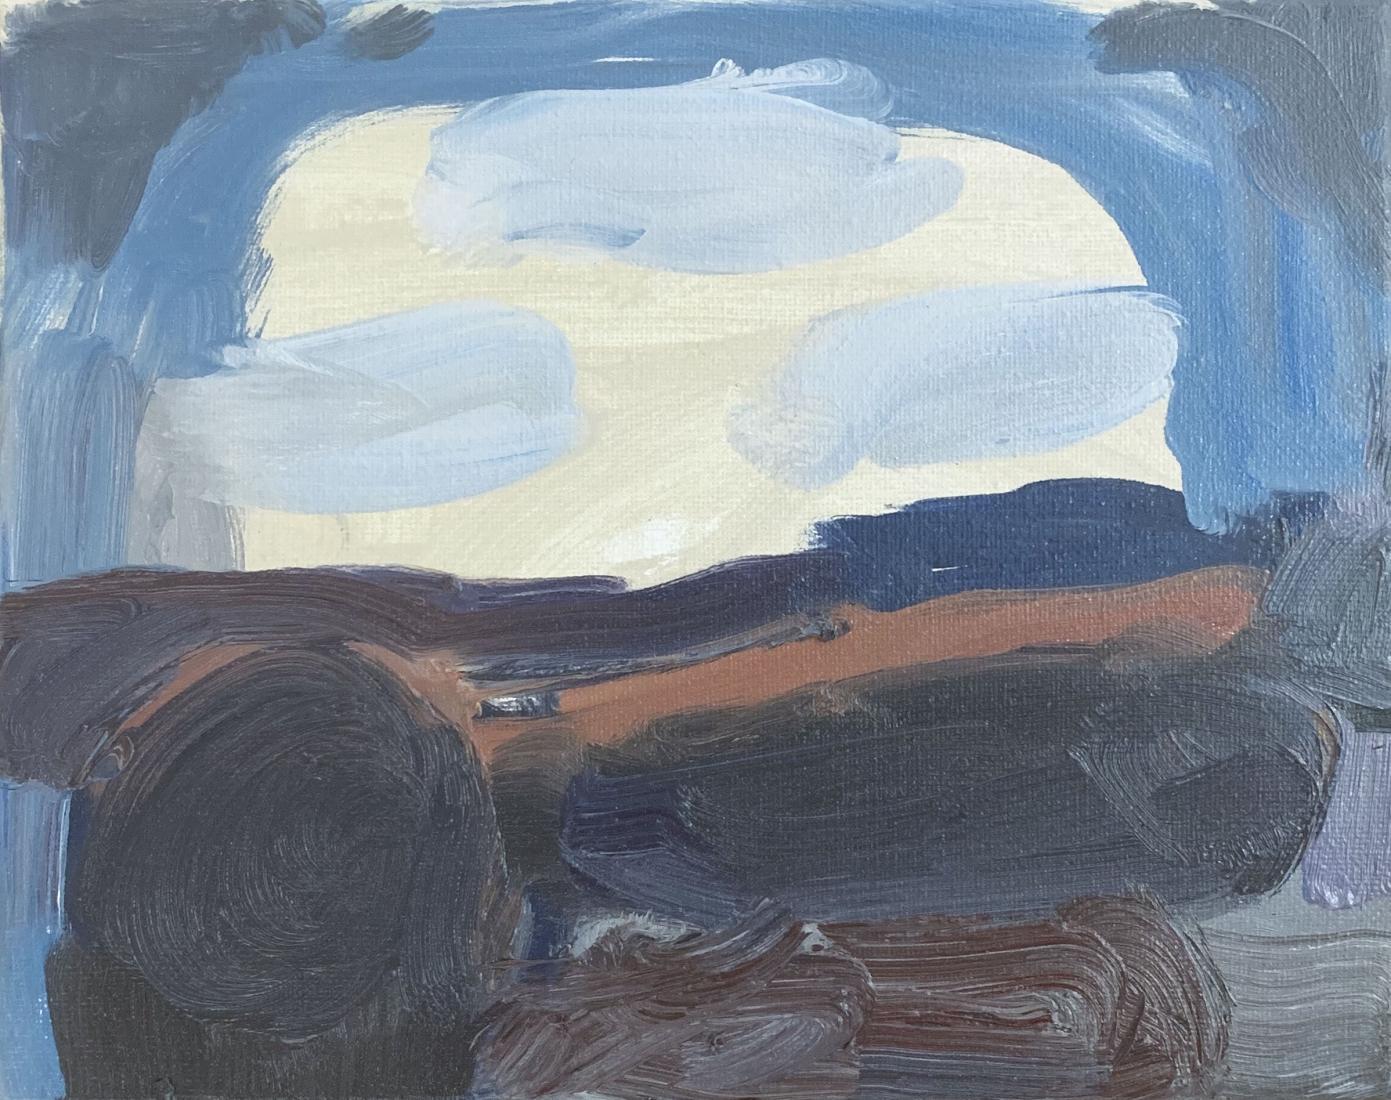 "Virva Hinnemo. After Dark. 2019. Oil on Canvas. 8"" x 10"""